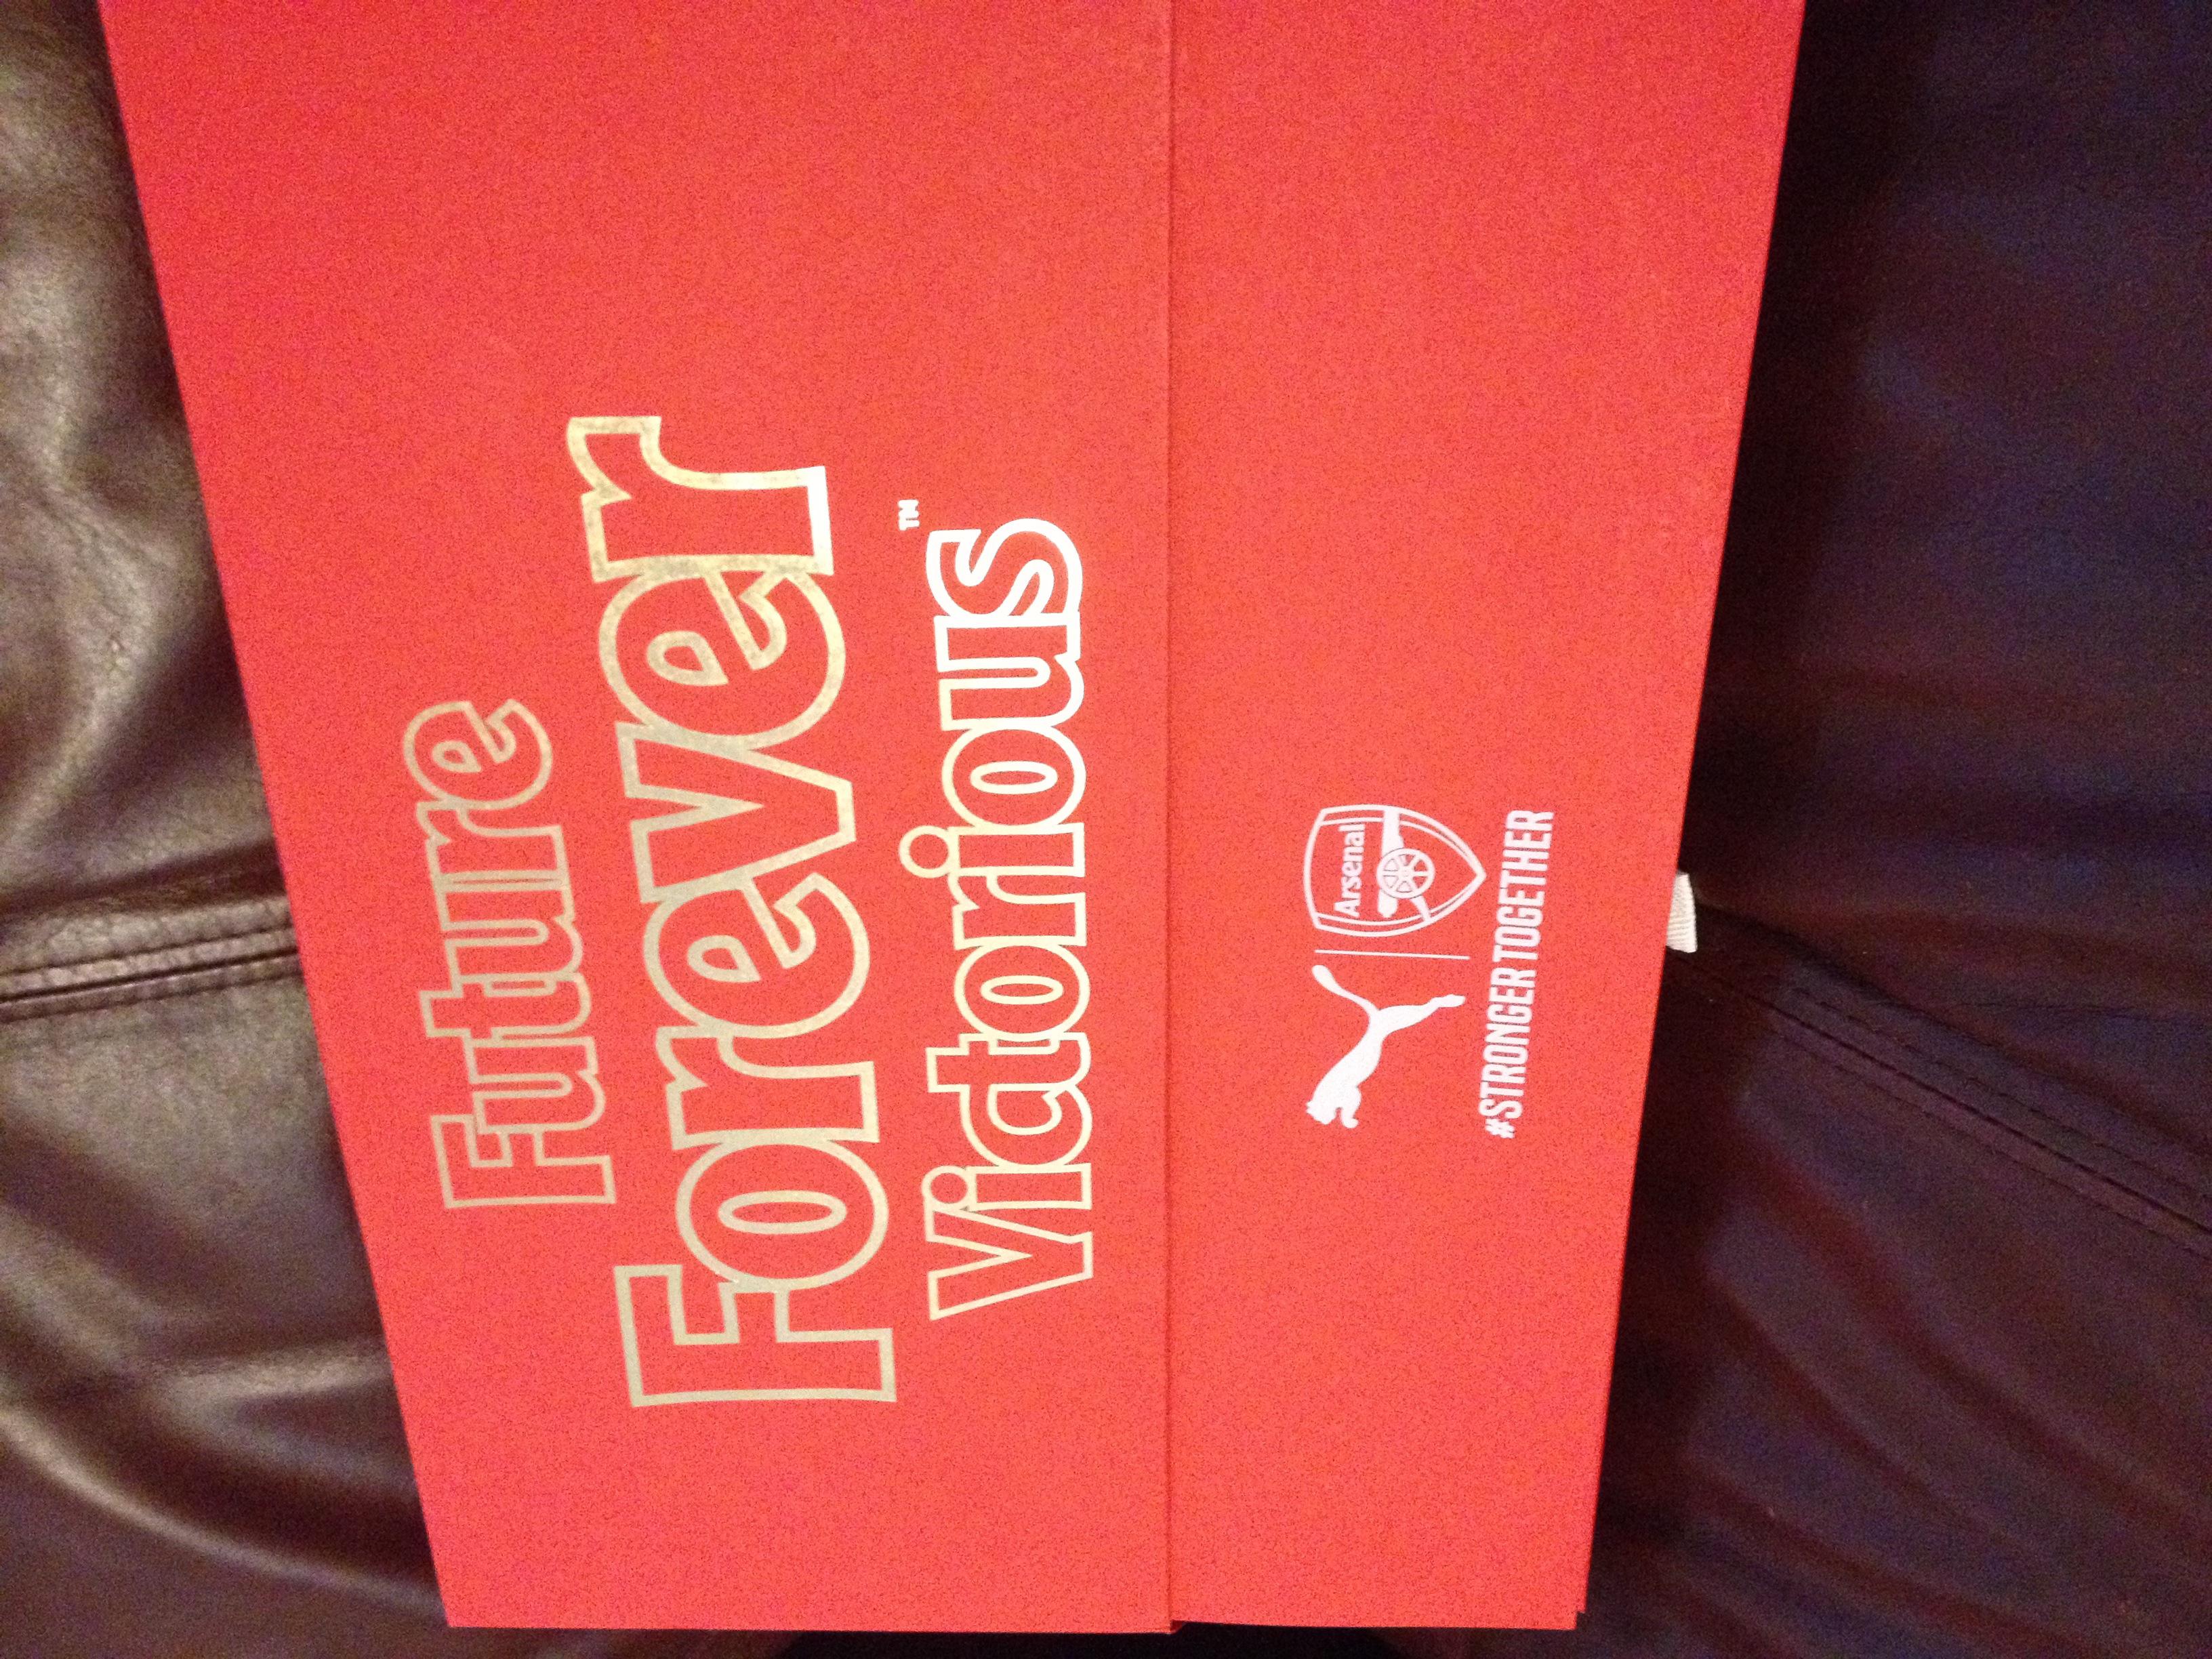 3c19327f10e6fa Puma Home Kit Presentation Box - The Center Circle - A SoccerPro ...